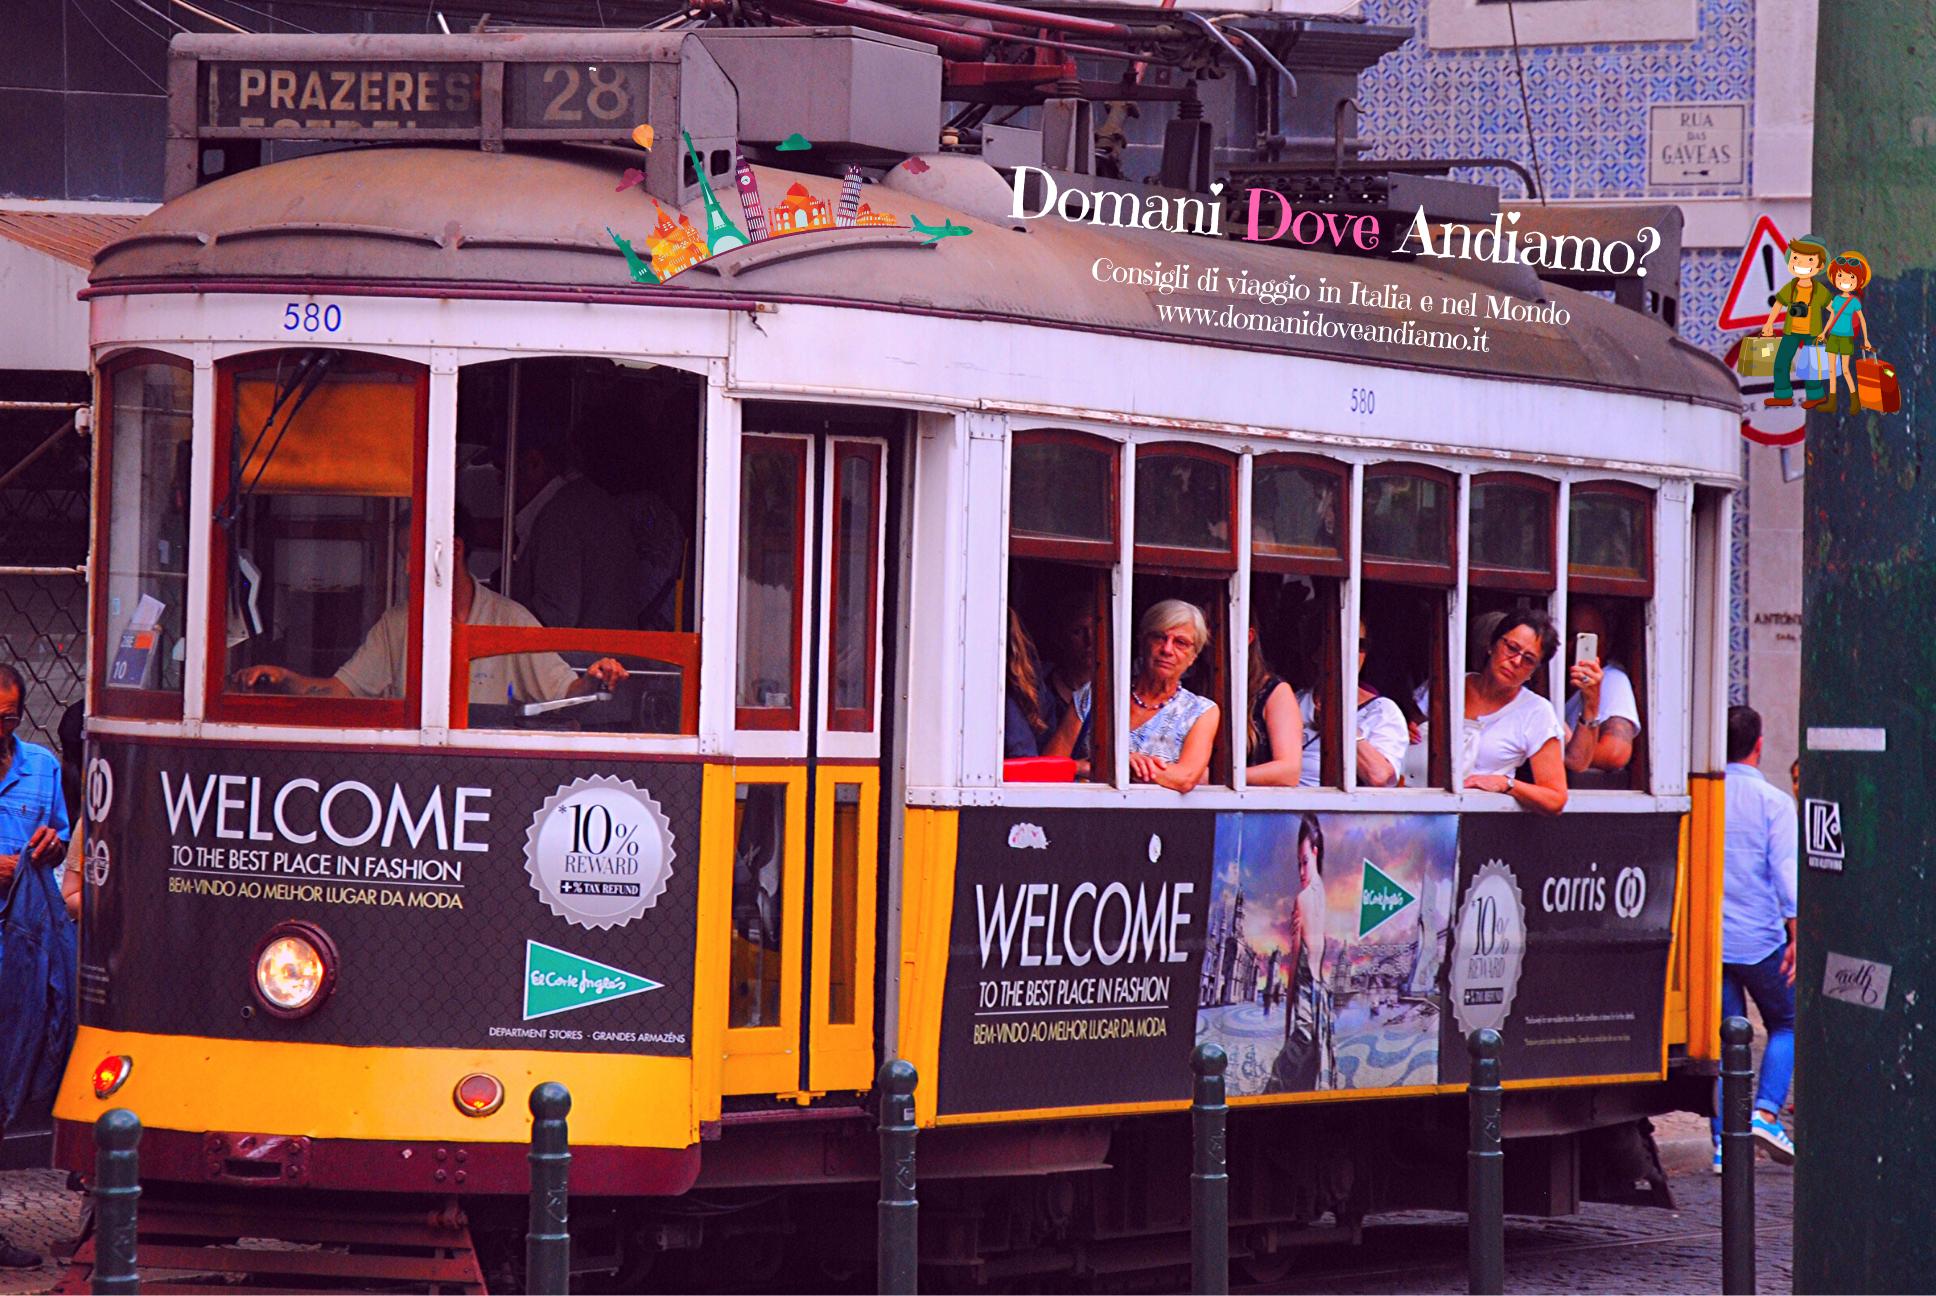 Tram Remodelado